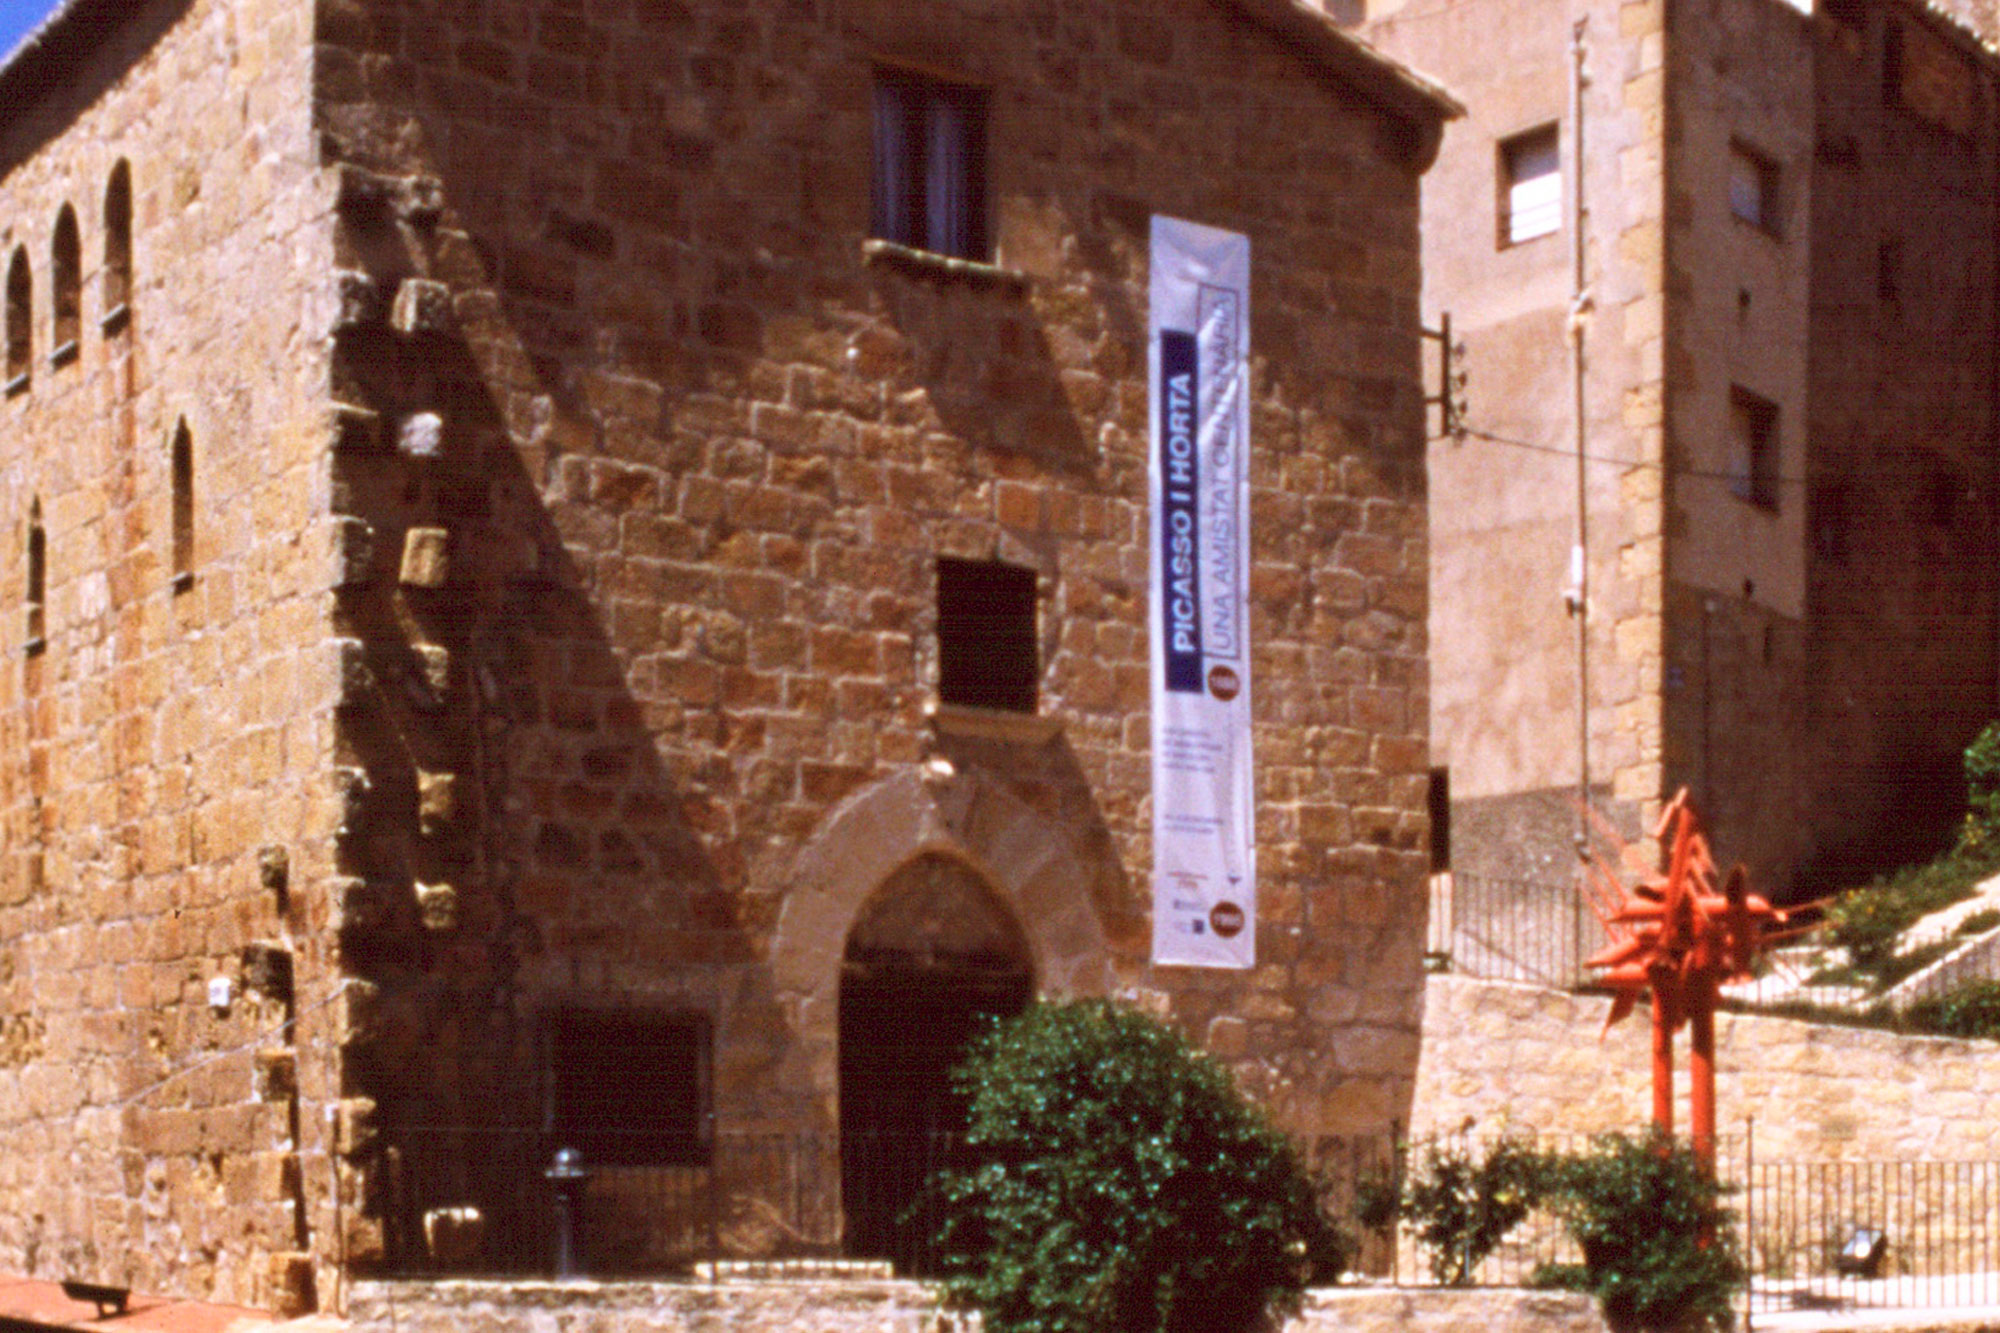 Centre Picasso en Horta de sant Joan